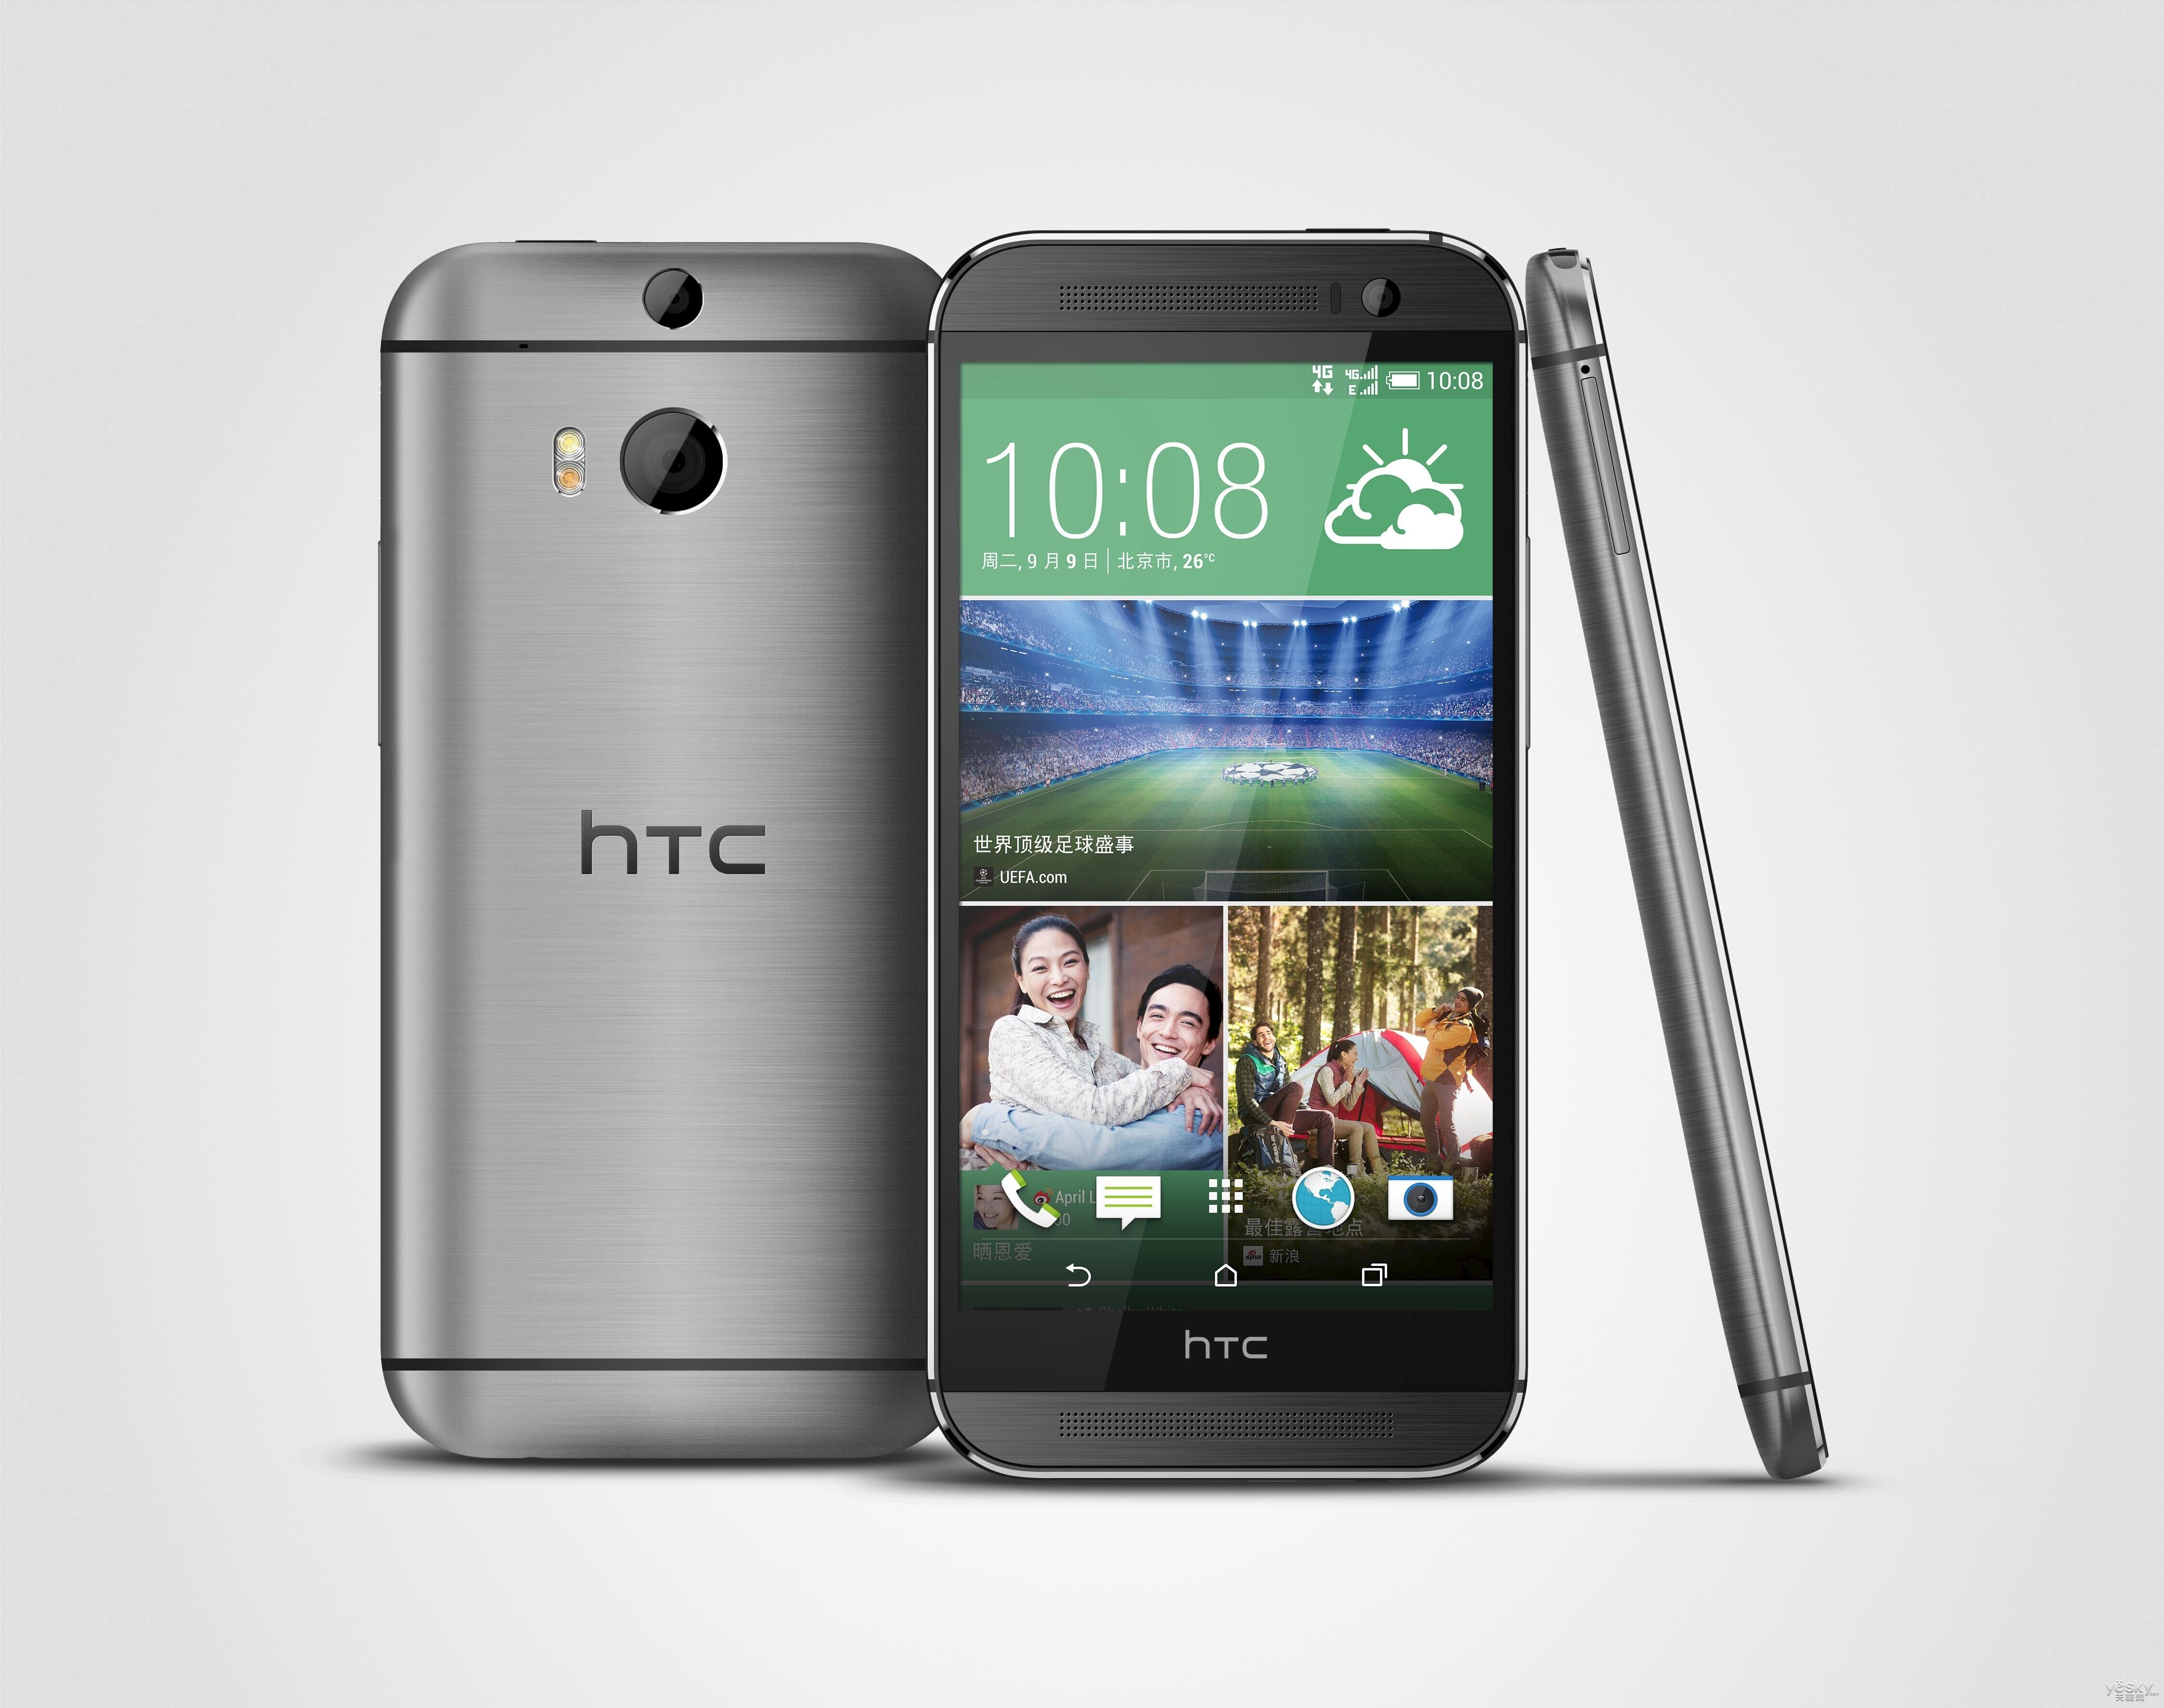 htc�yn�/&_htc手机真要卖了?应该就是这样!